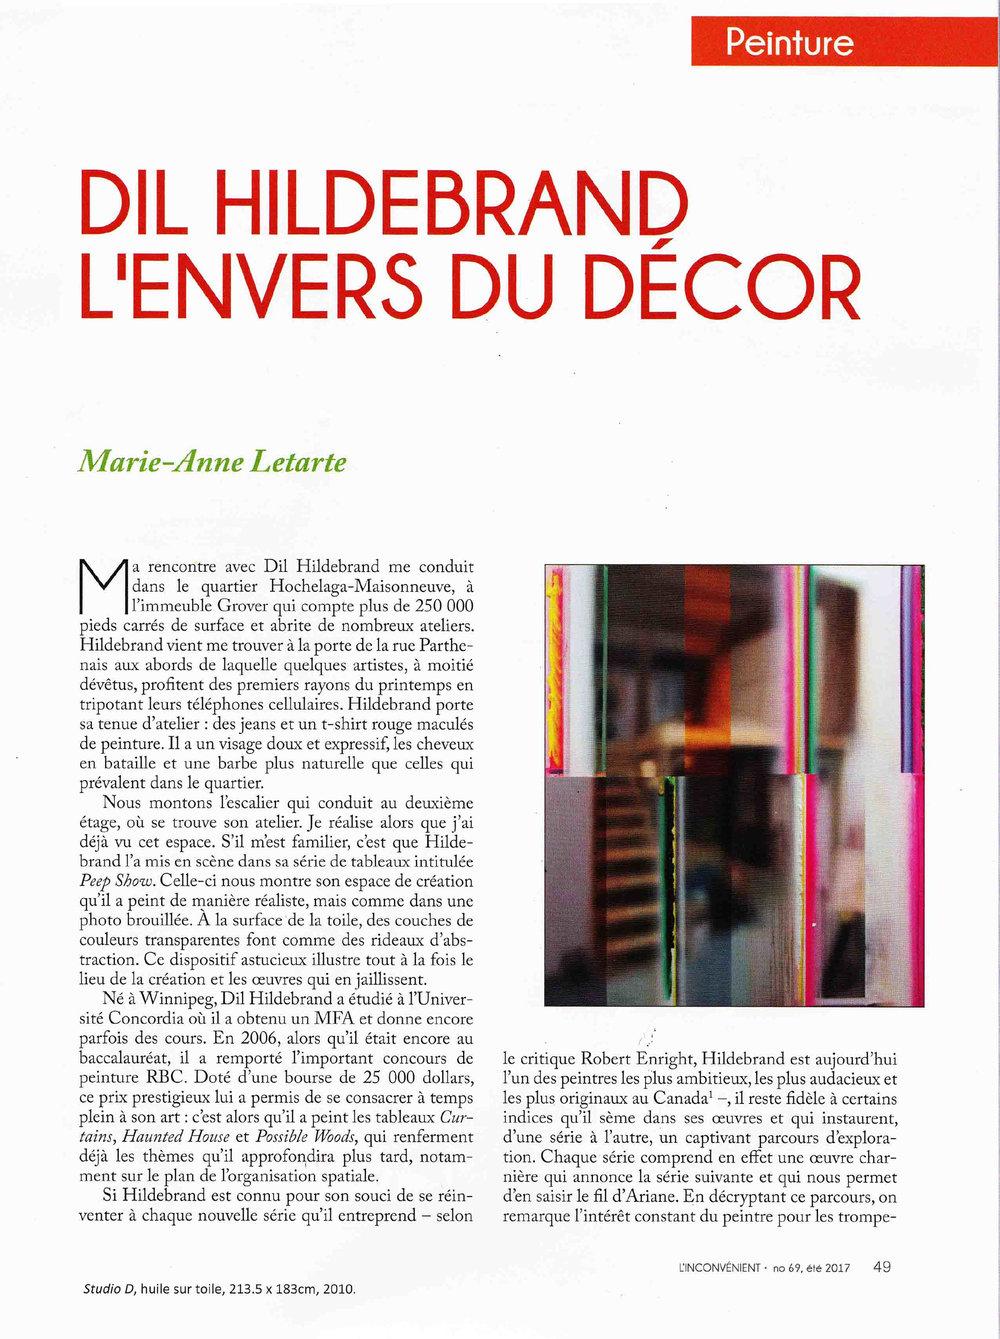 Dil-Hildebrand_cover_linconvenient-3.jpg